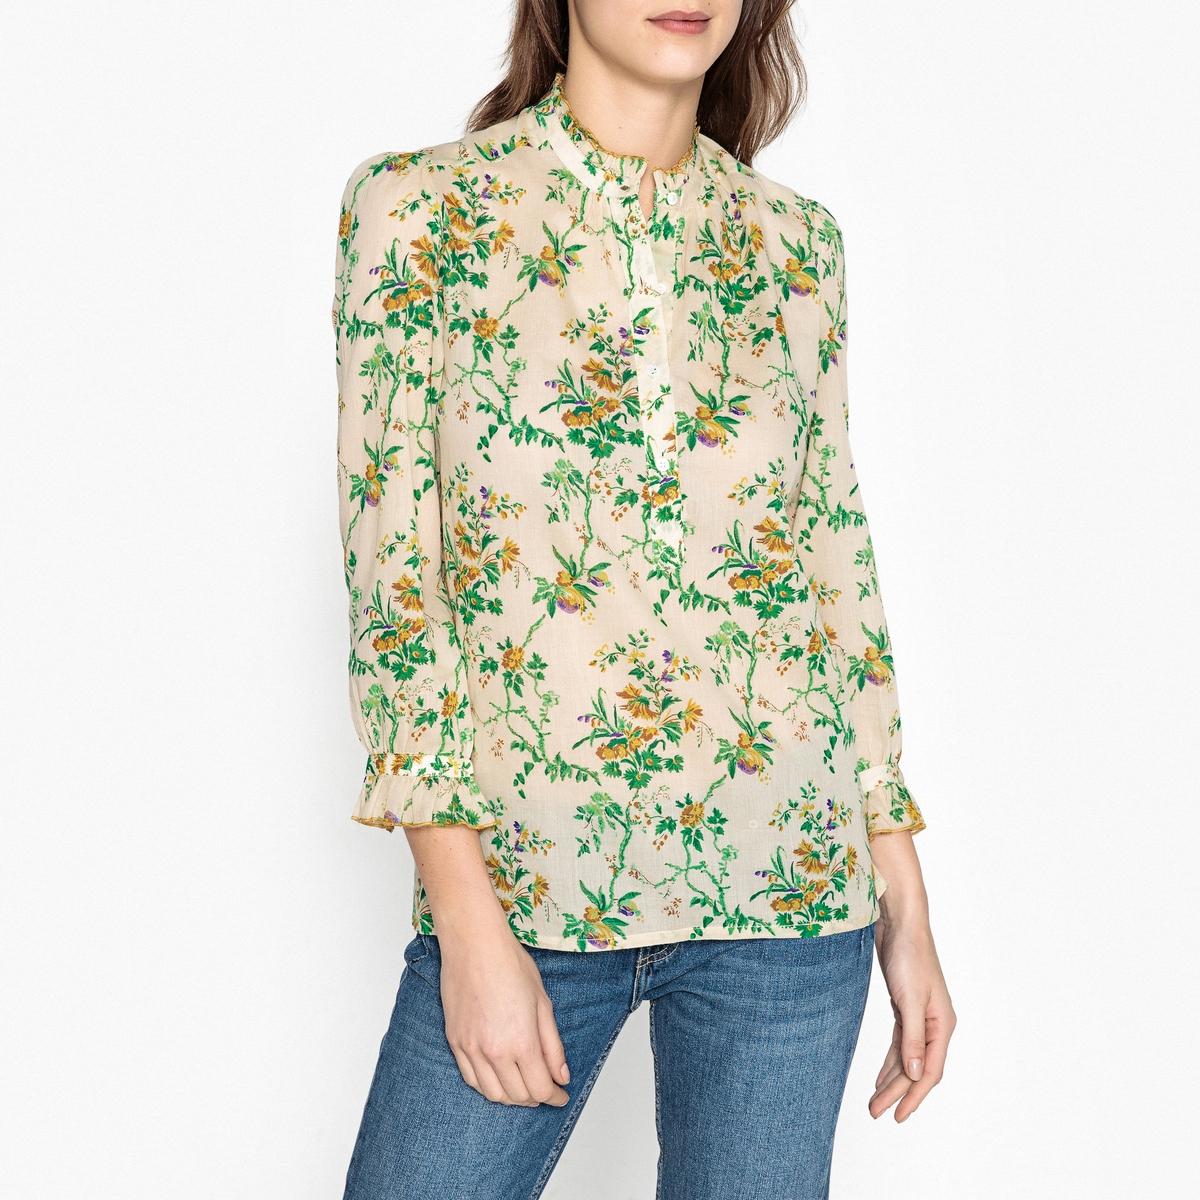 Блузка с рисунком и небольшими воланами BETTY